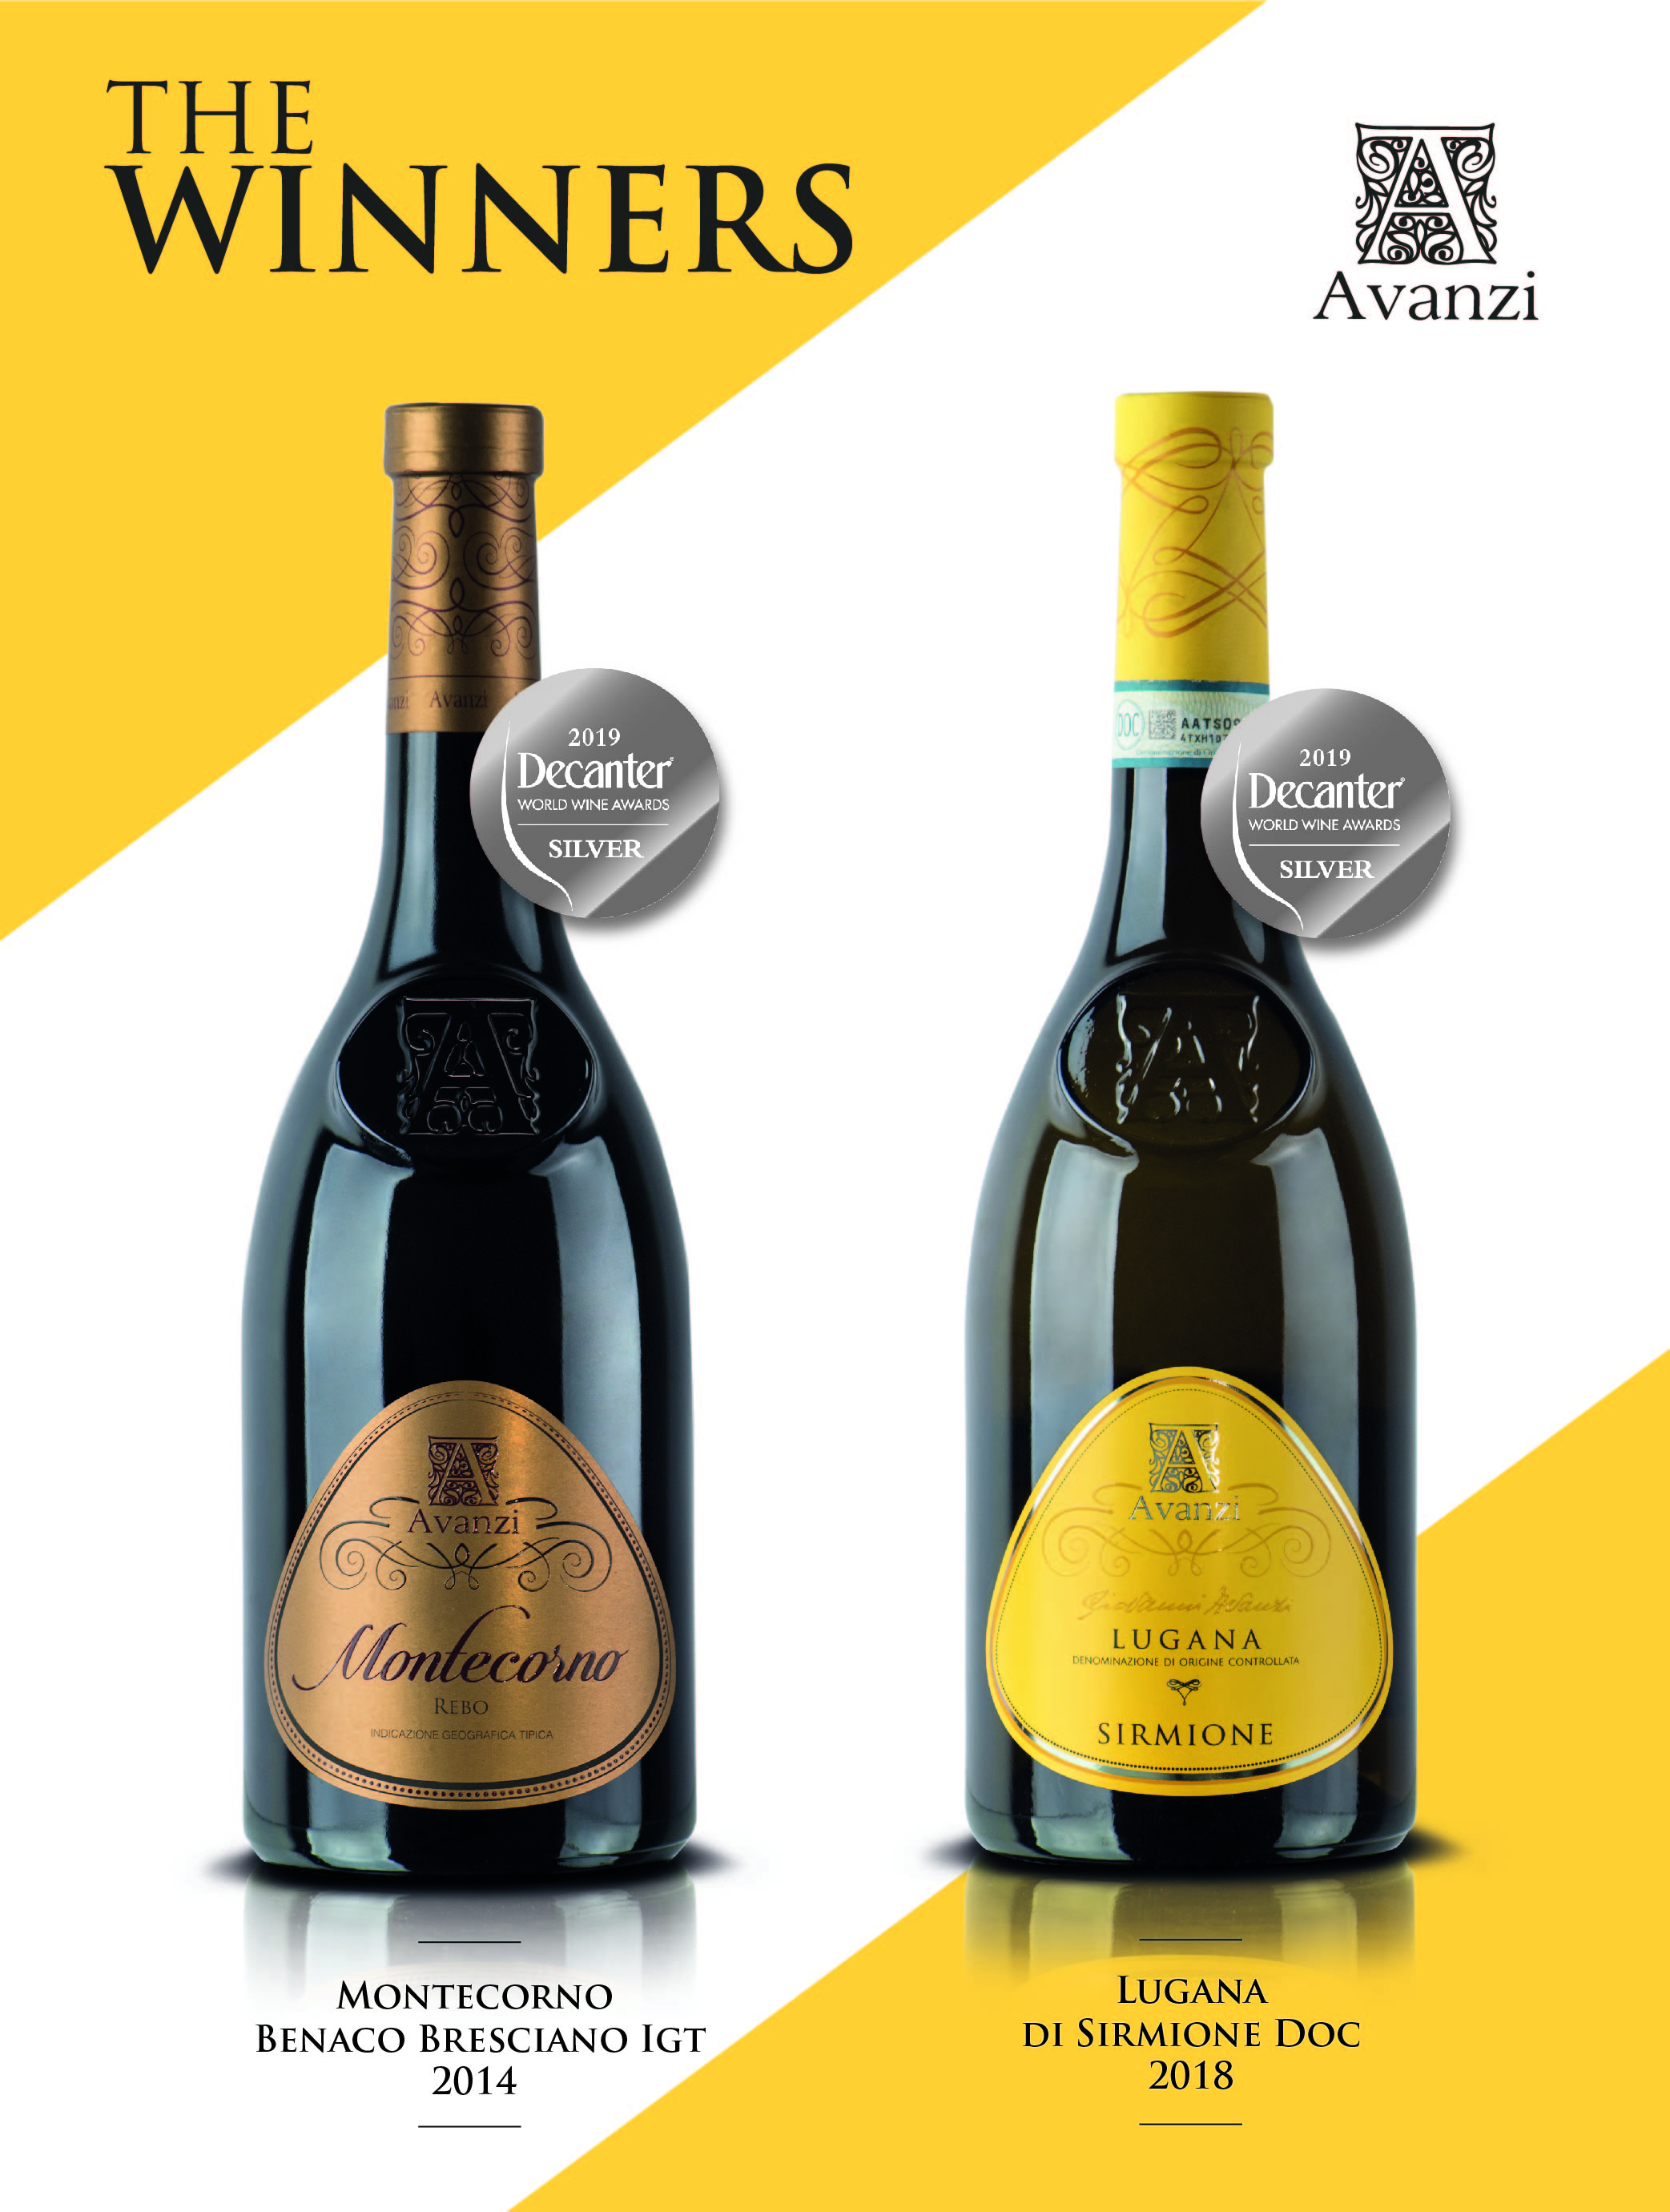 Medaglia d' ARGENTO al Decanter World Wine Awards (DWWA) LONDON 2019!